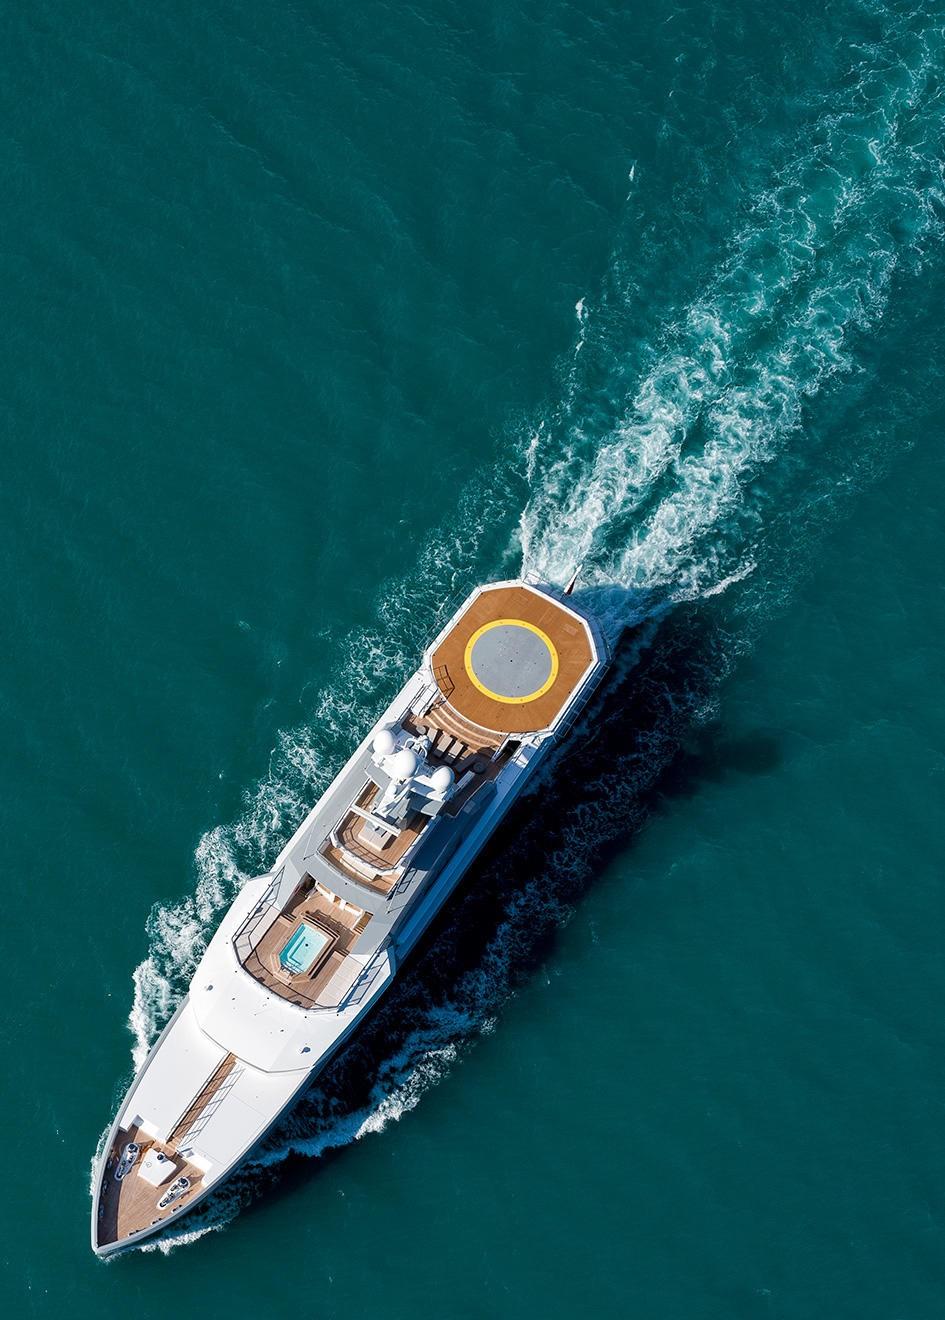 The 72m Yacht CLOUDBREAK